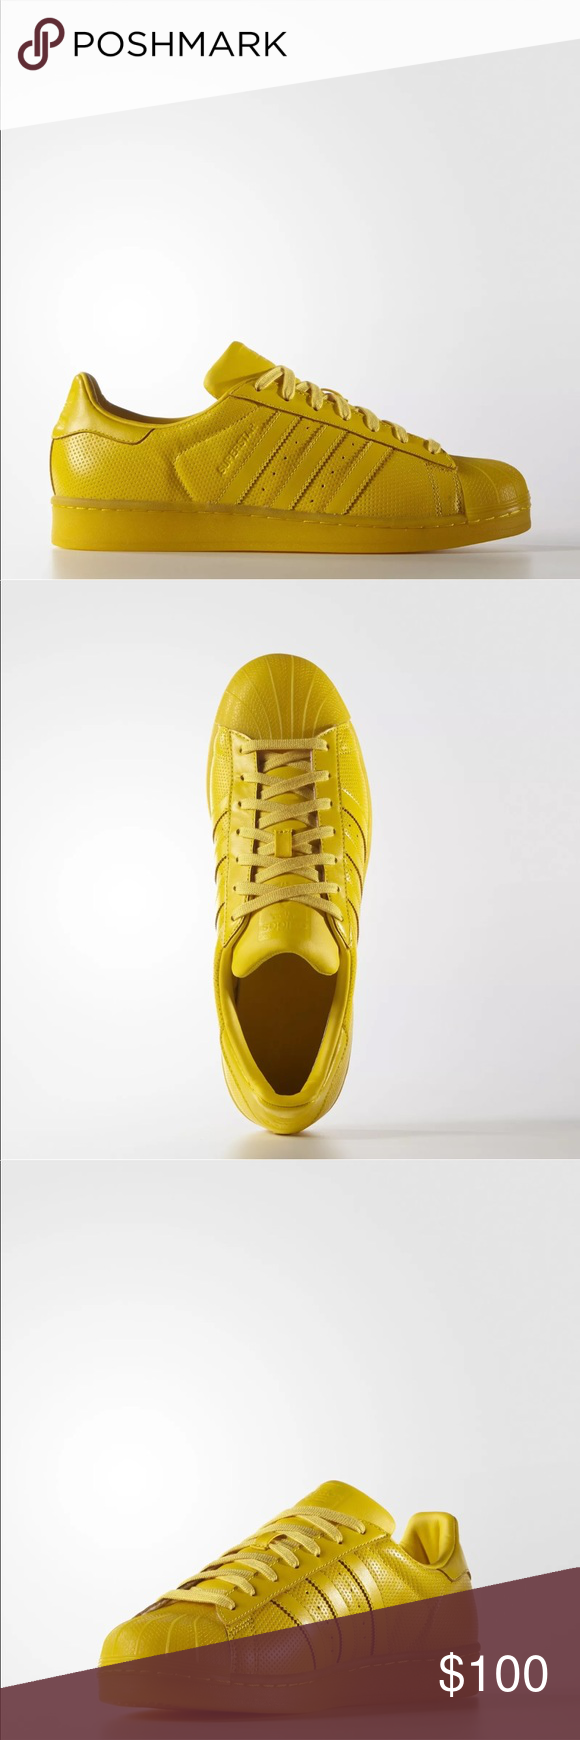 Adidas Superstar Scarpe Gialle, Uomini E Donne, Boutique Adidas